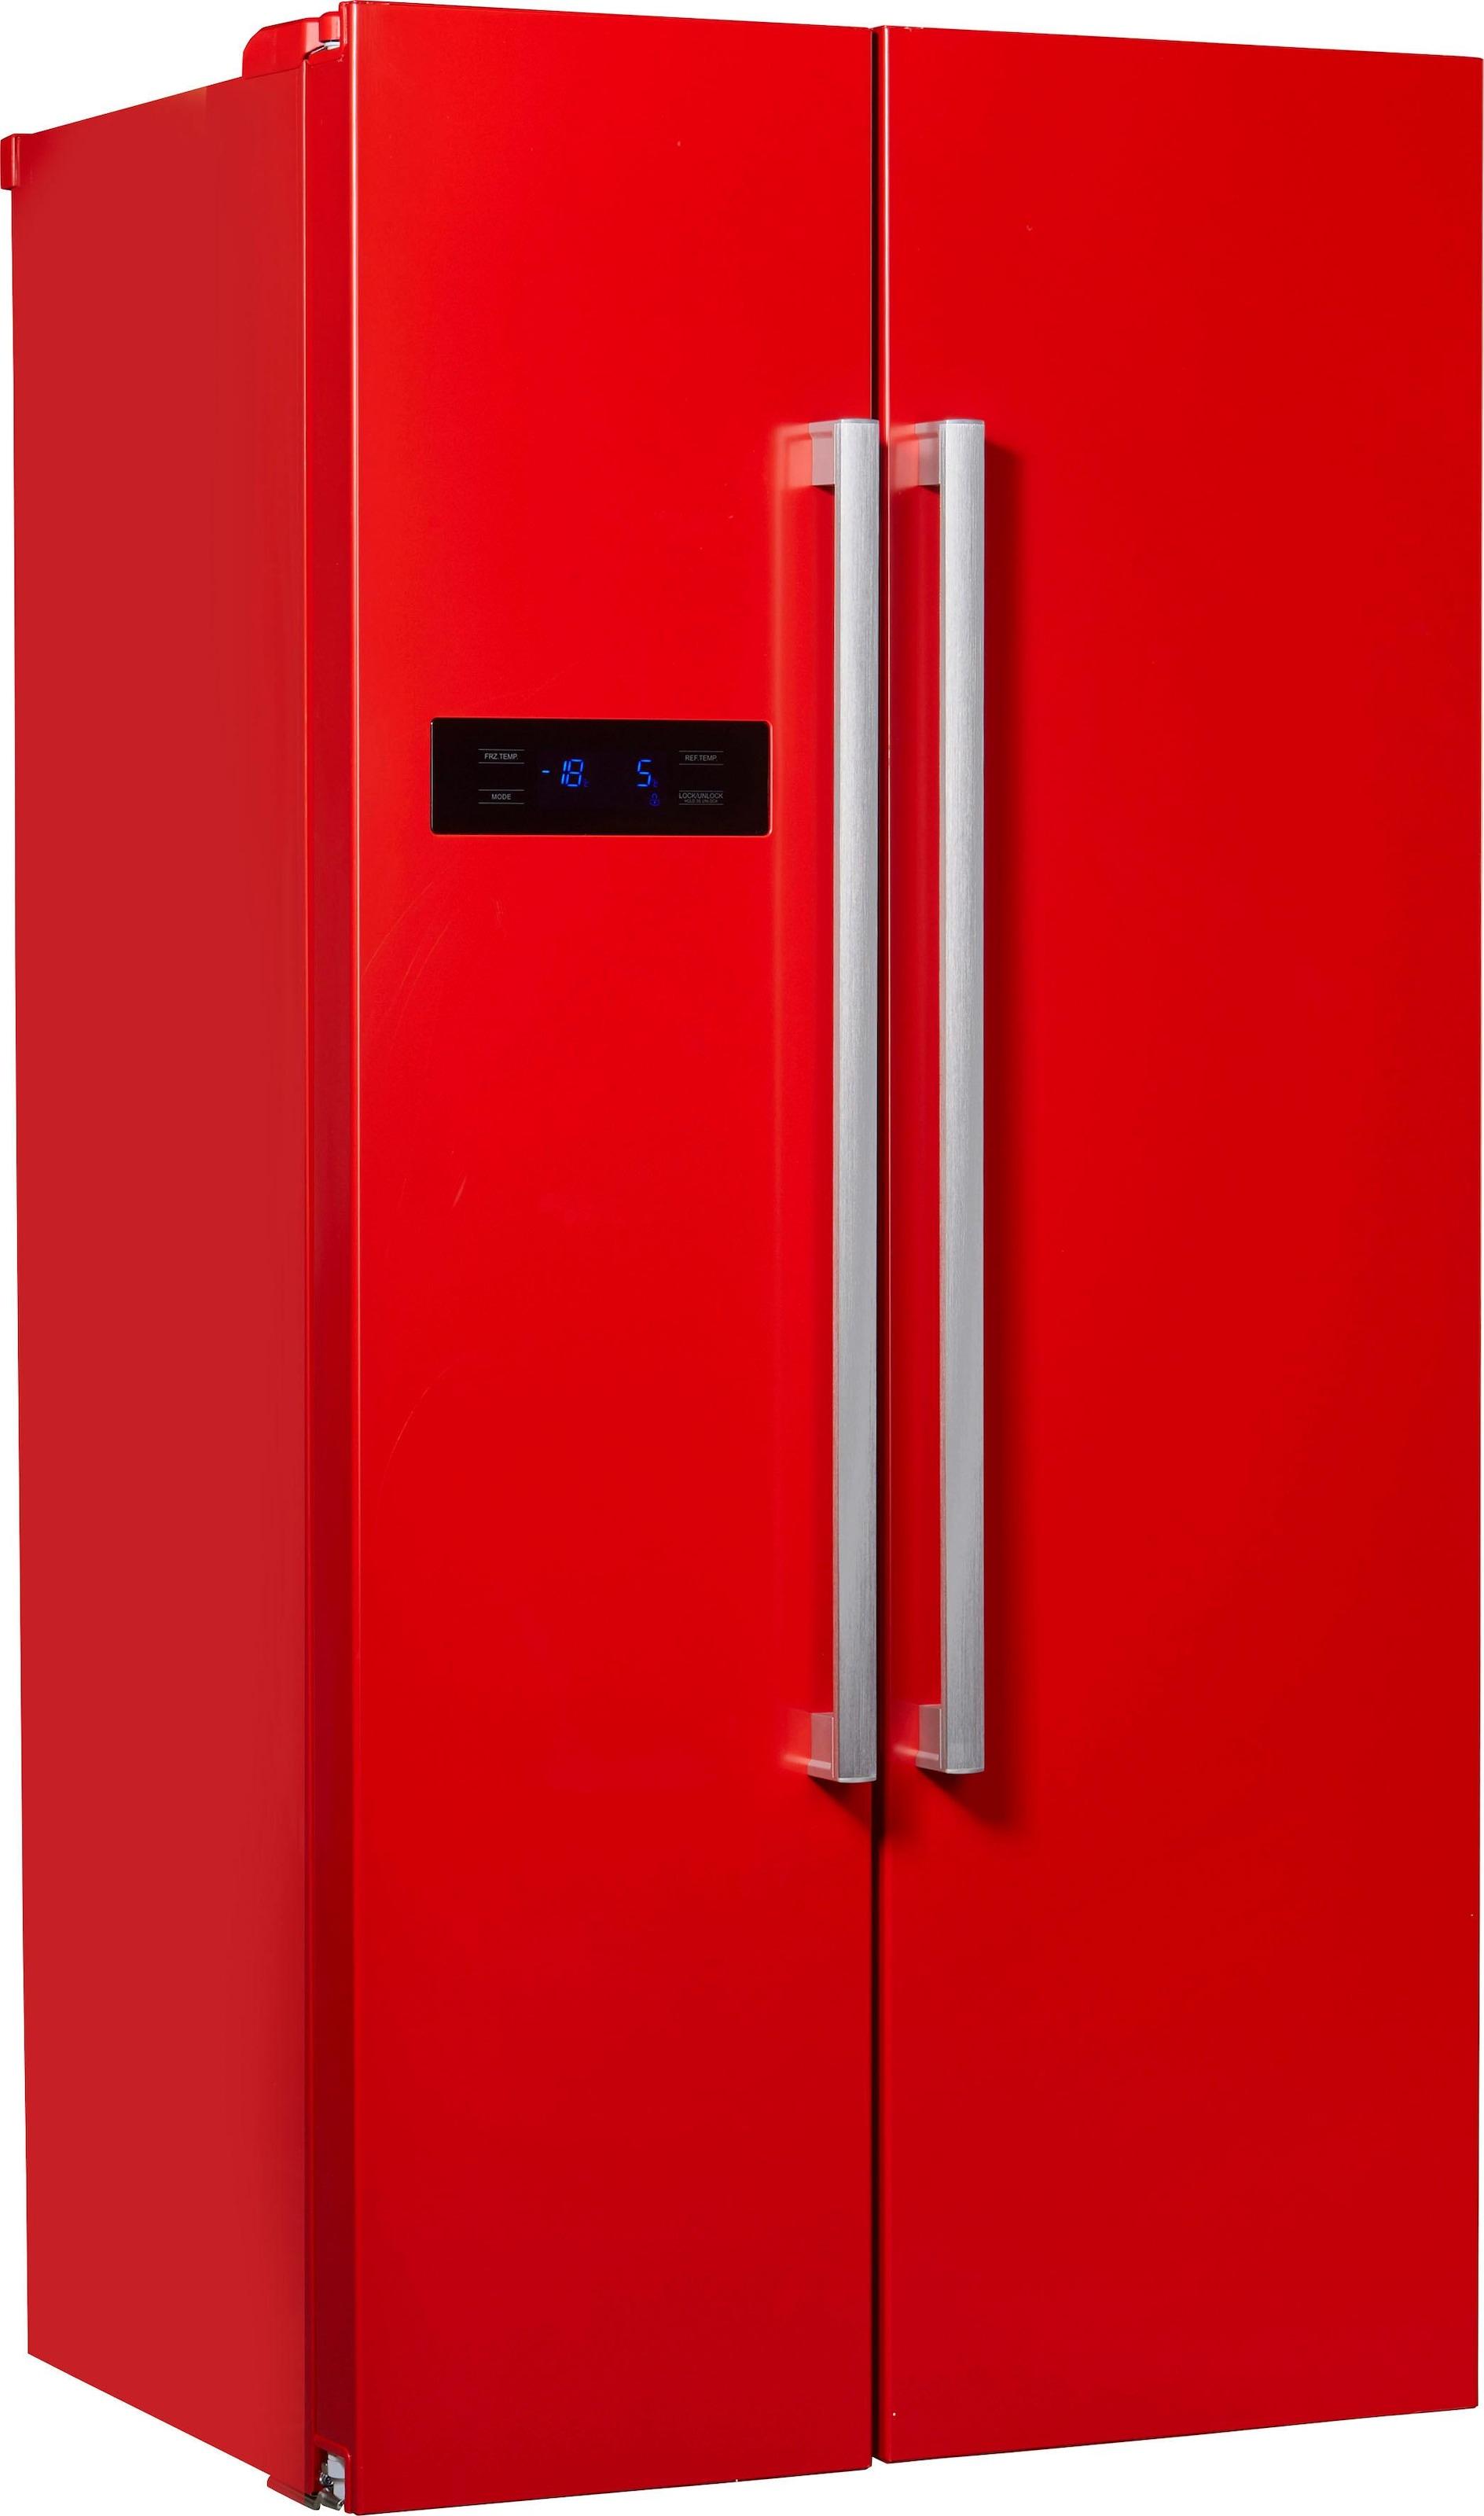 Side By Side Kühlschrank Günstig Kaufen : Side by side kühlschrank auf rechnung raten kaufen